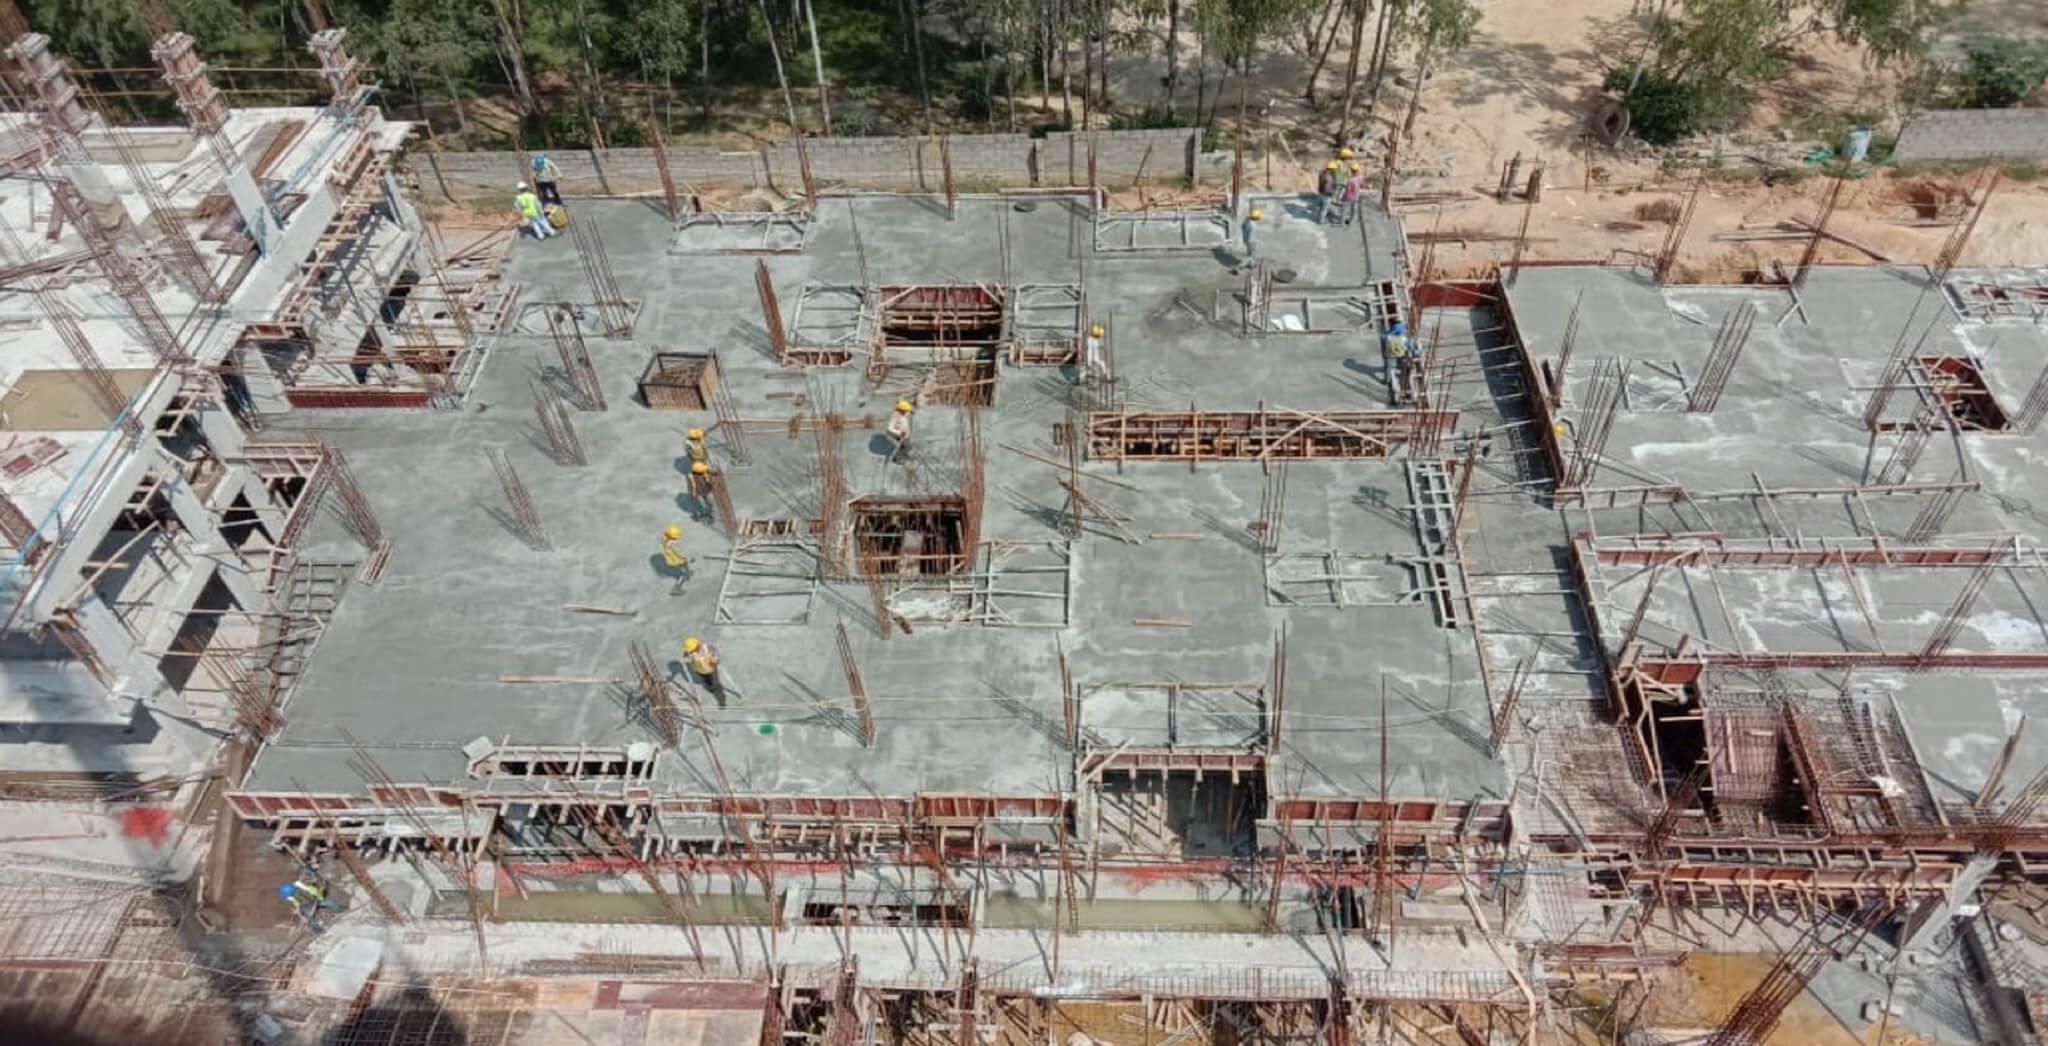 Nov 2019 - North side view: P Block—First floor slab completed, first floor to second floor column reinforcement work-in-progress